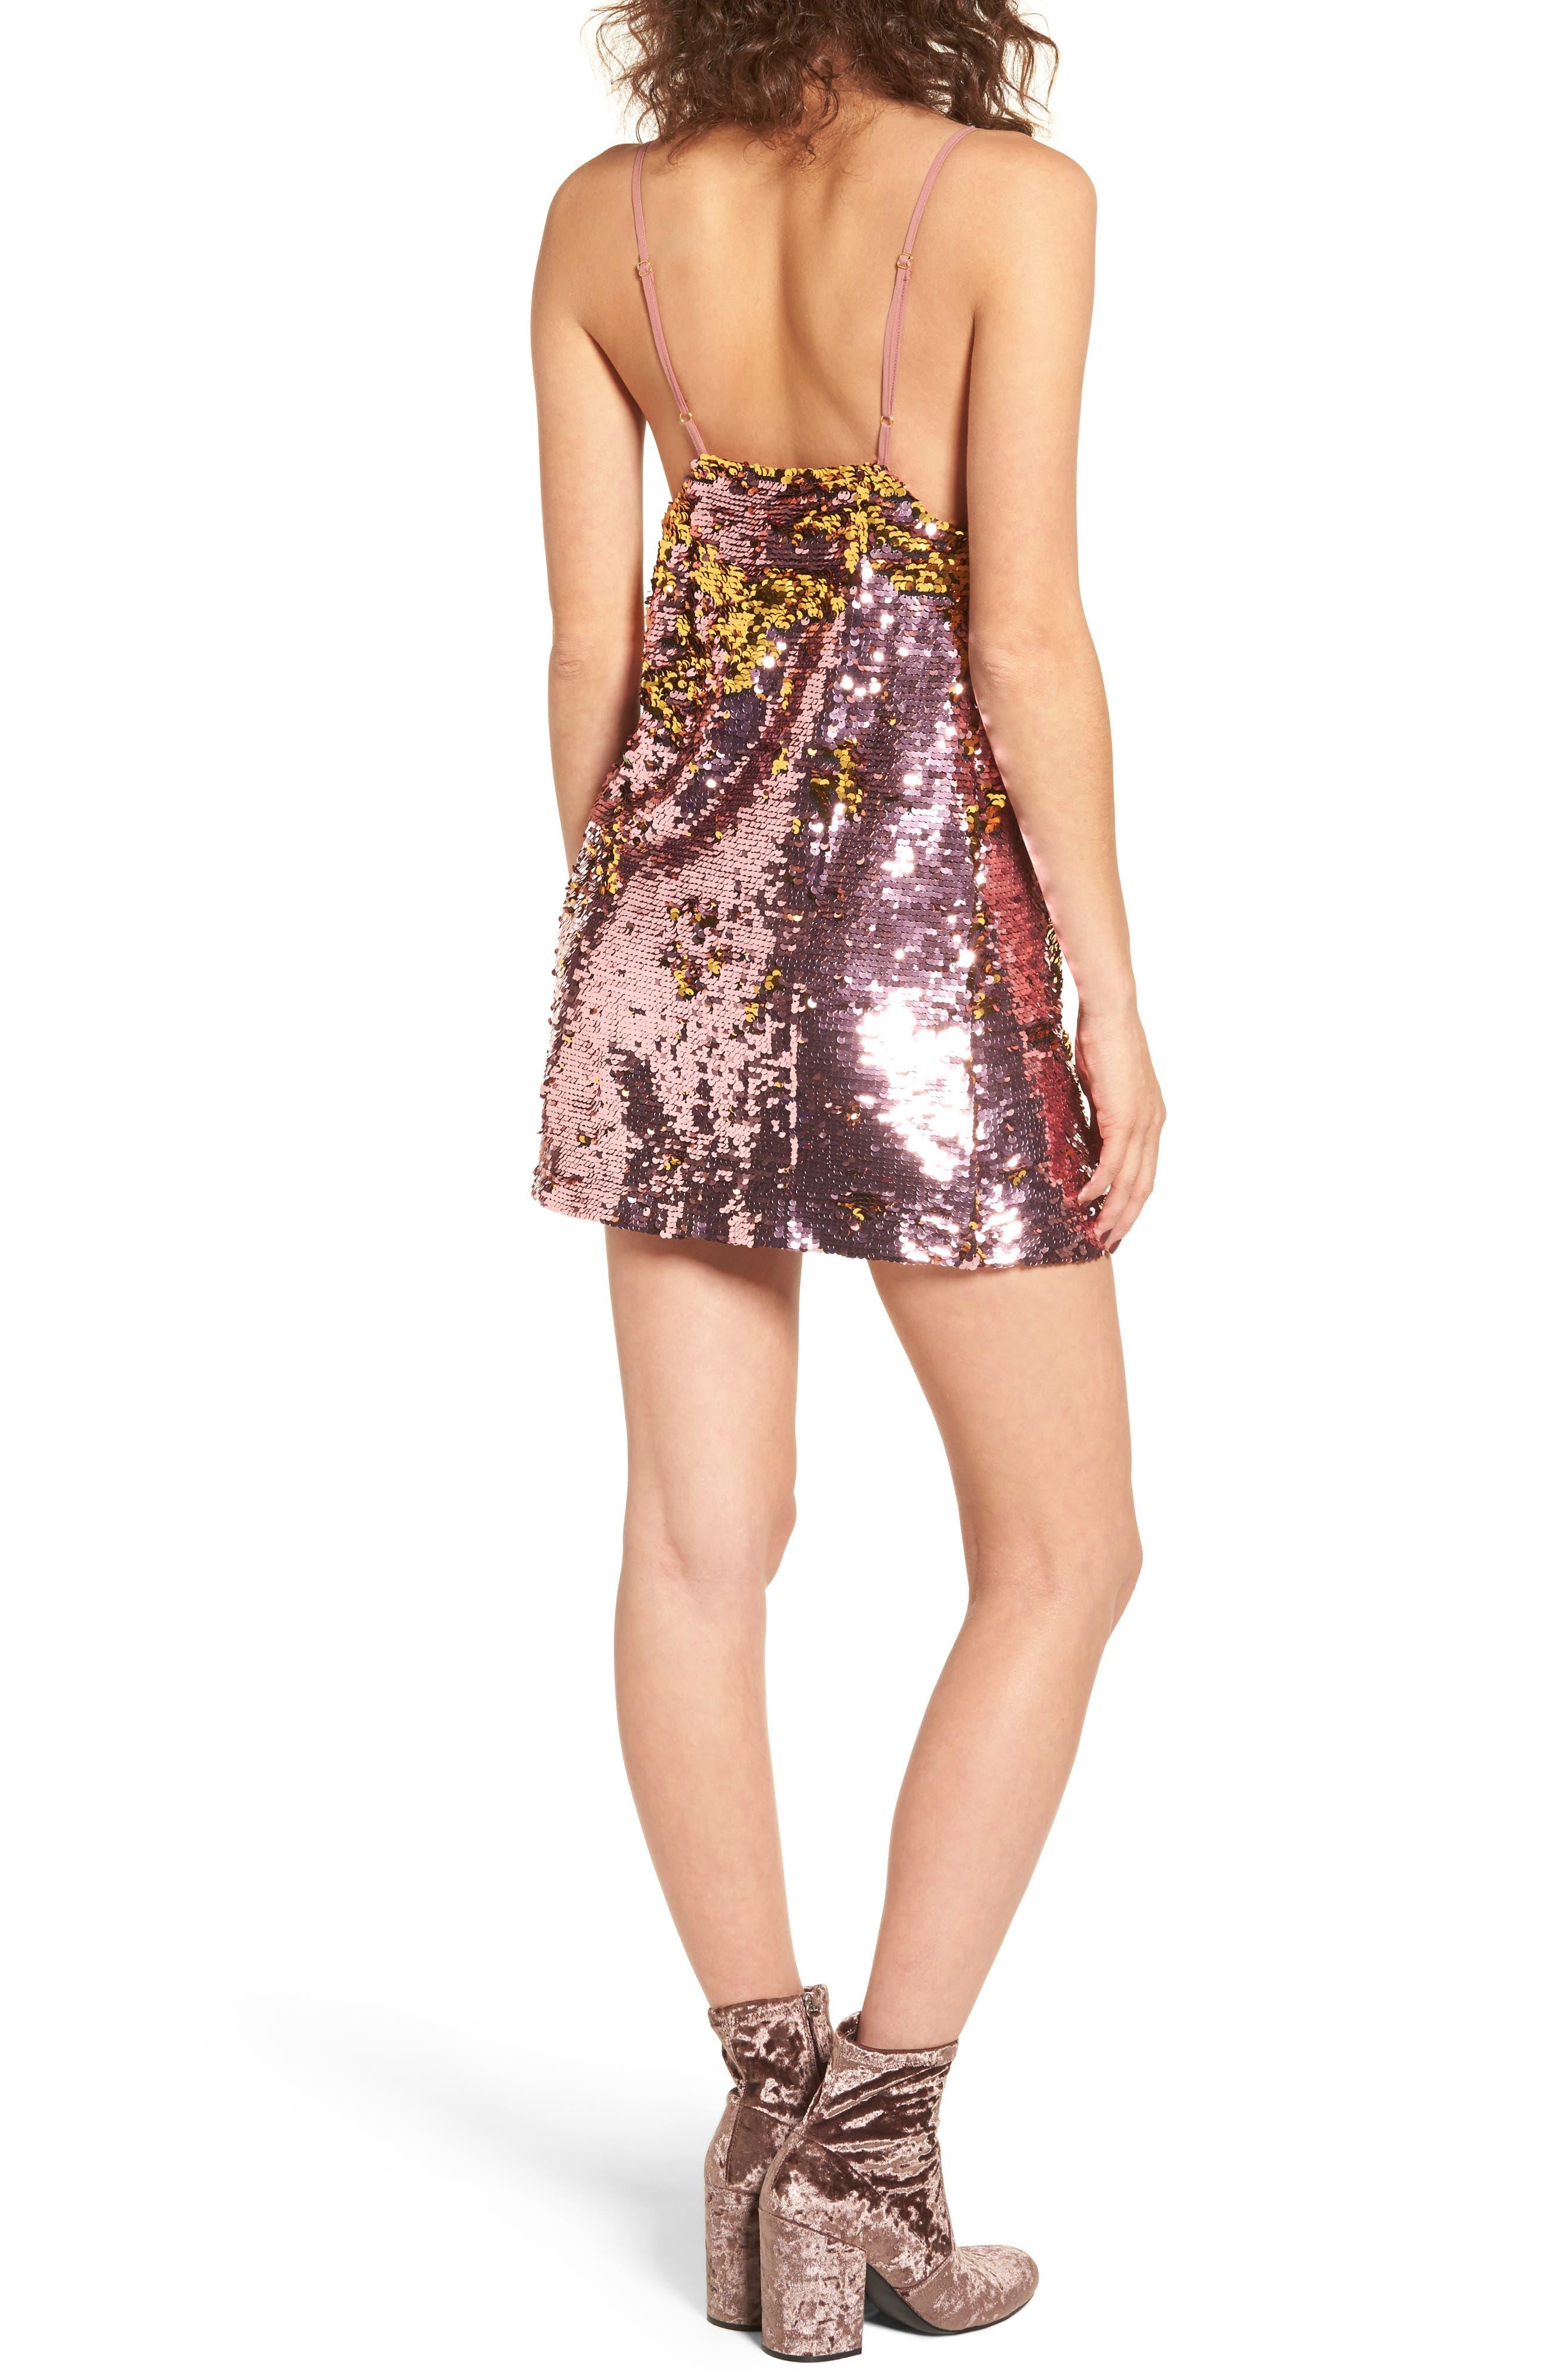 Sparklers Sequin Minidress,                             Alternate thumbnail 2, color,                             650